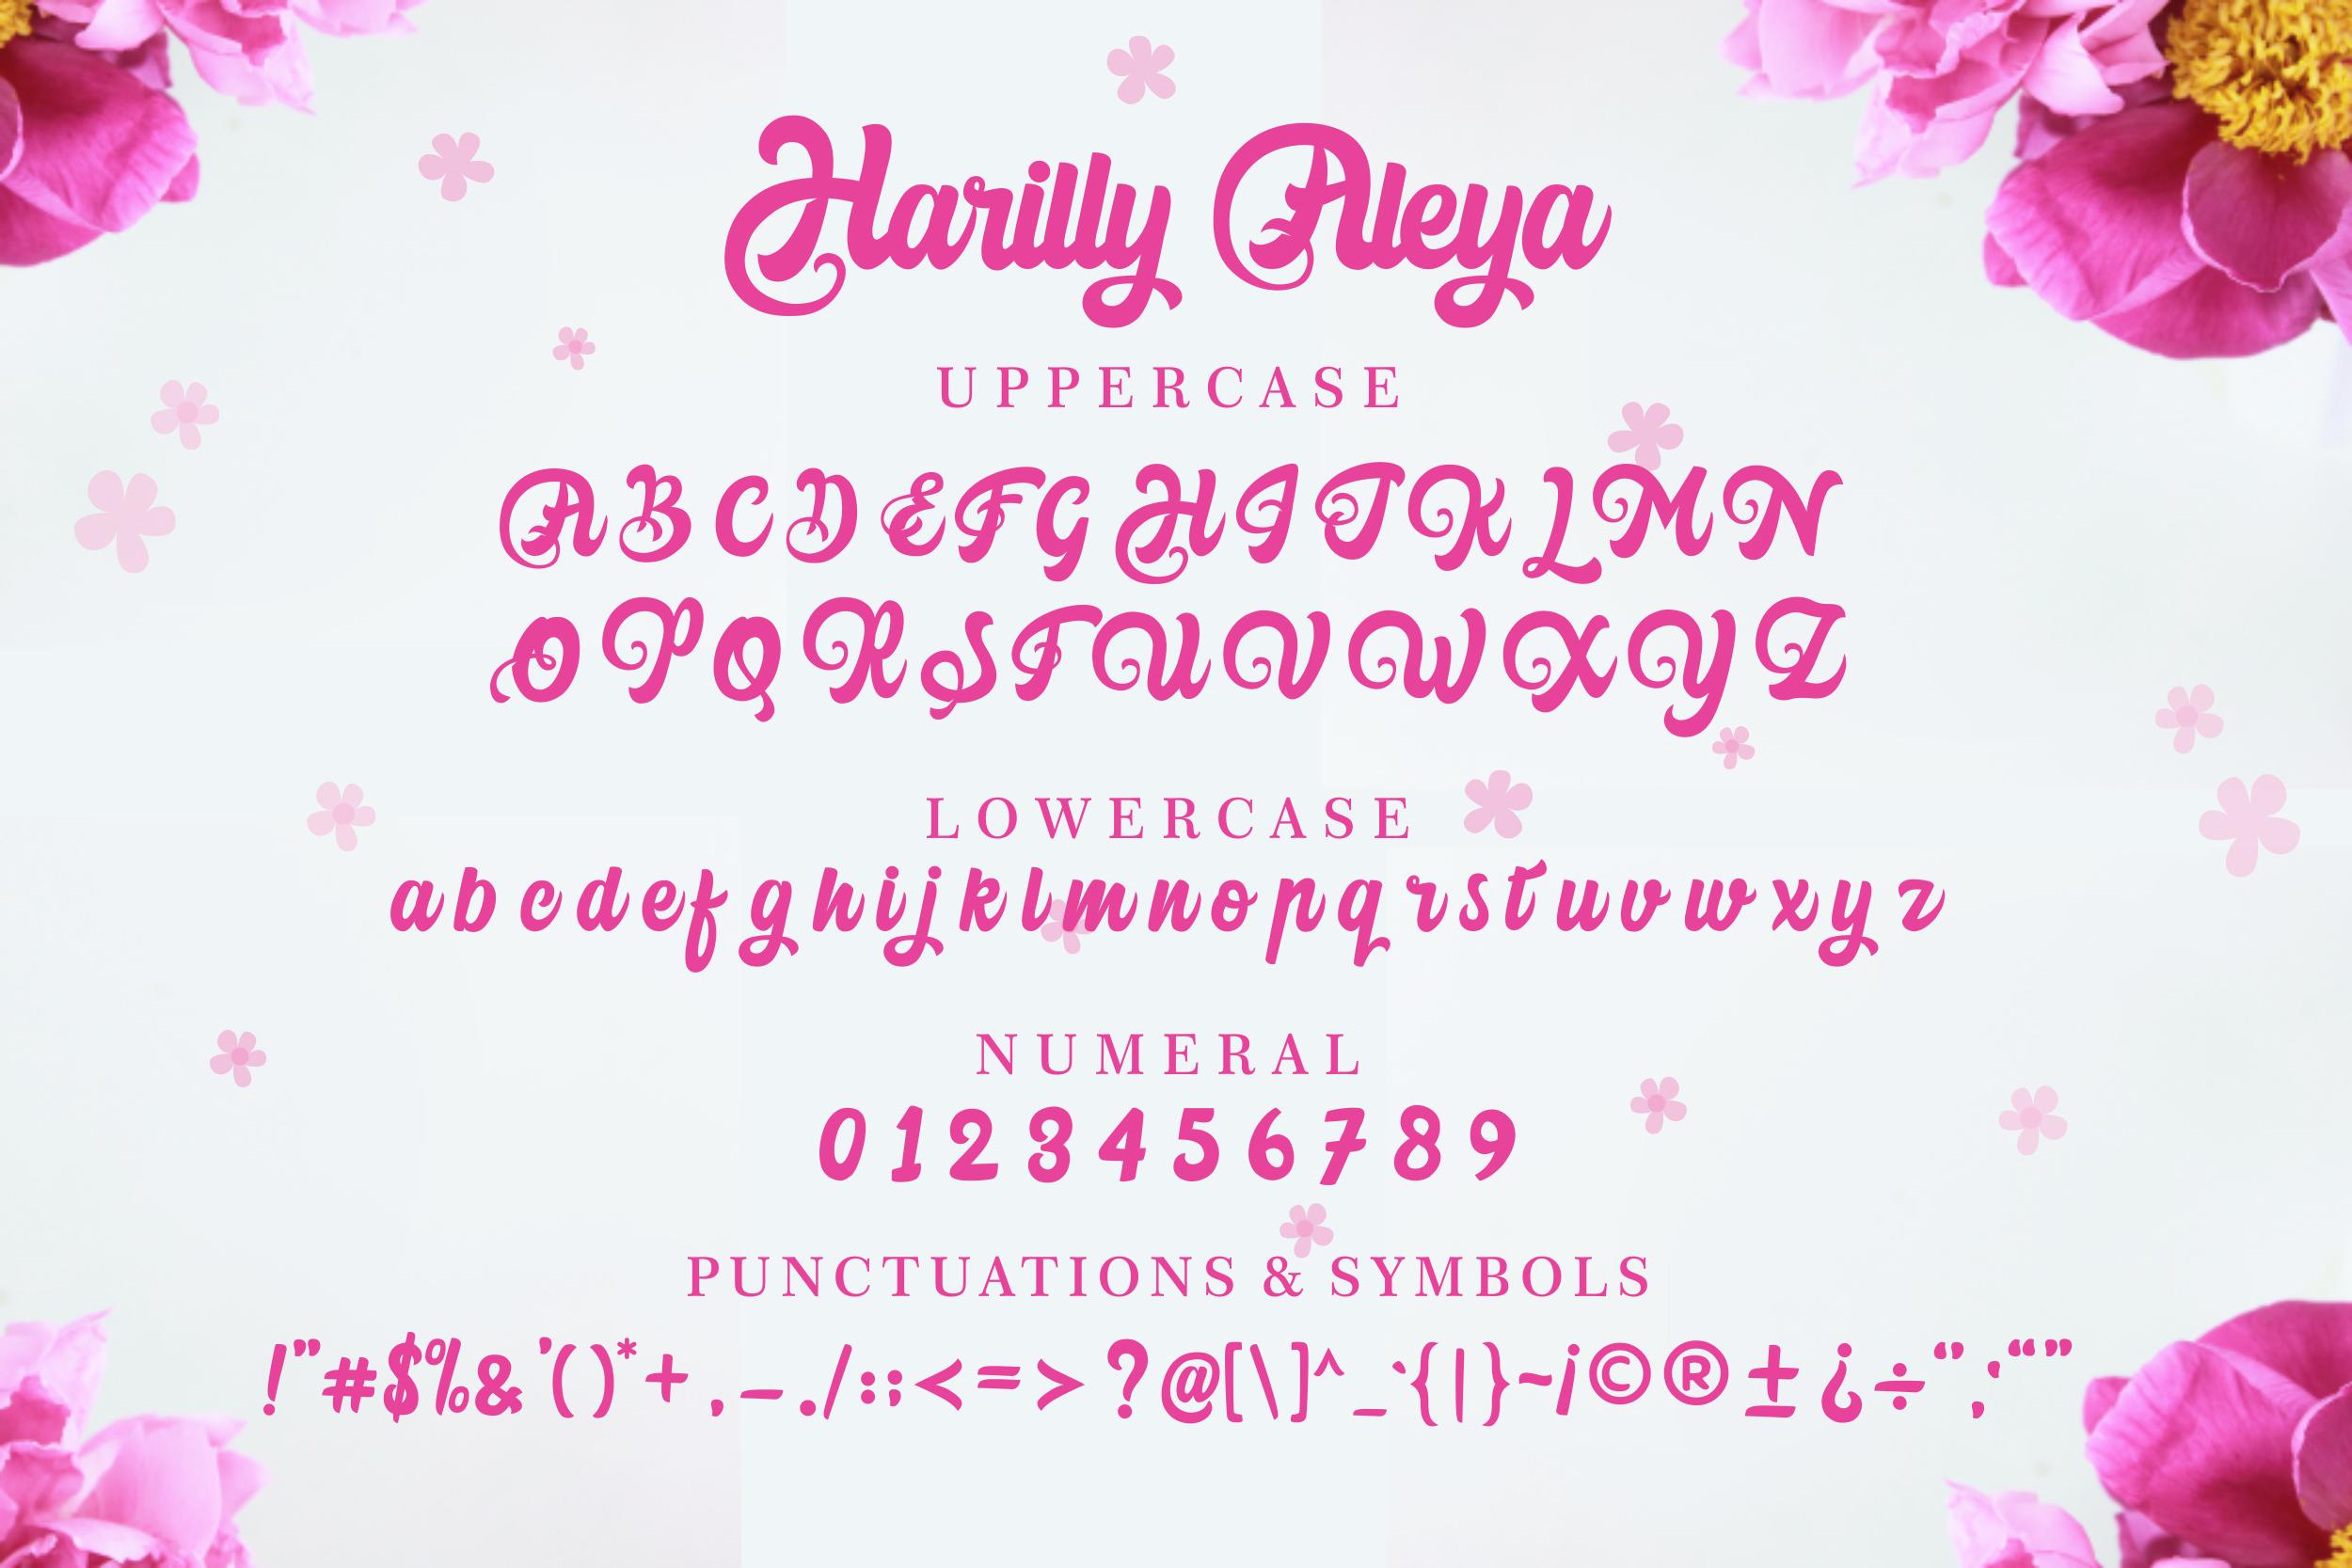 Harilly Aleya example image 5